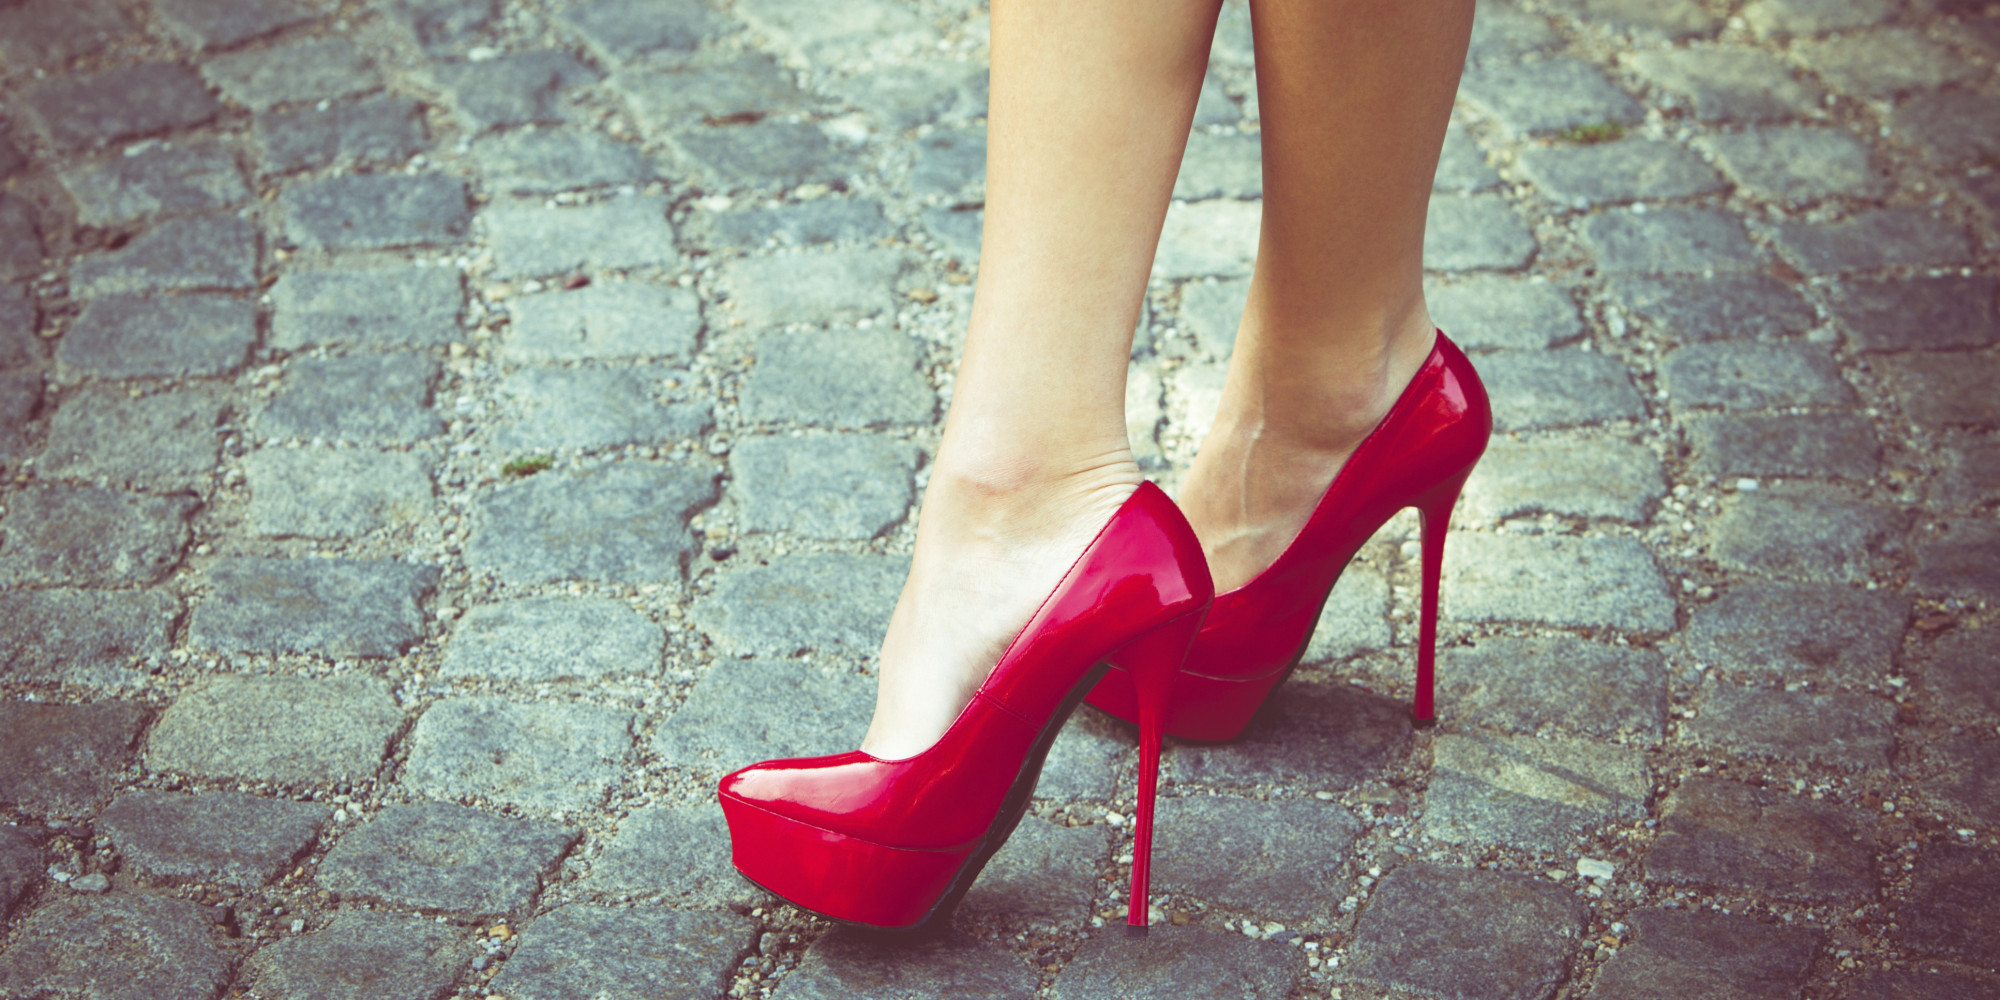 Heels Shoes Pictures Facebook